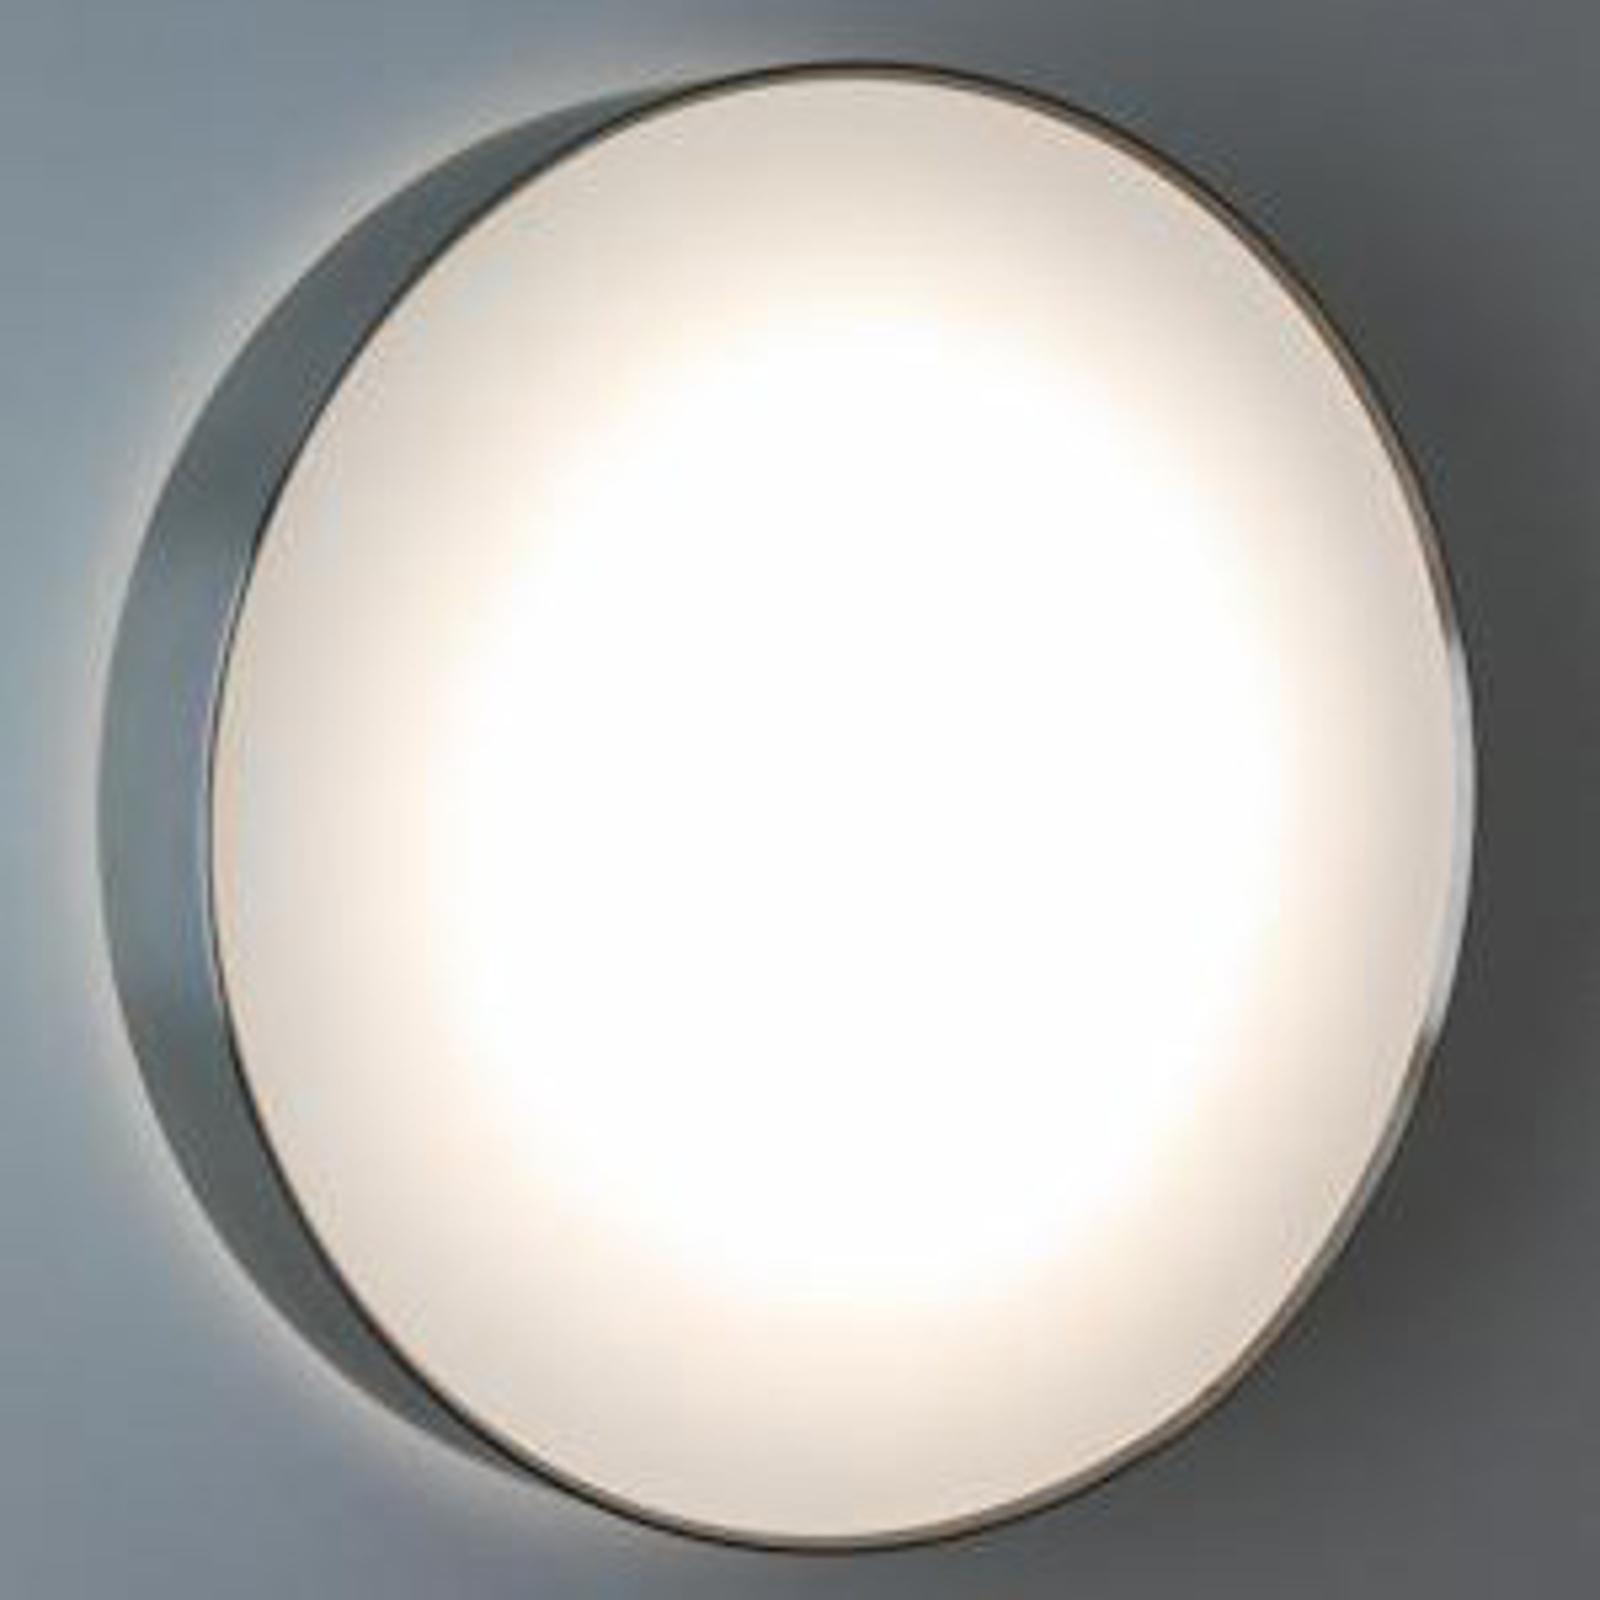 Sensor LED-lampa rostfritt stål SUN 4, 13 W